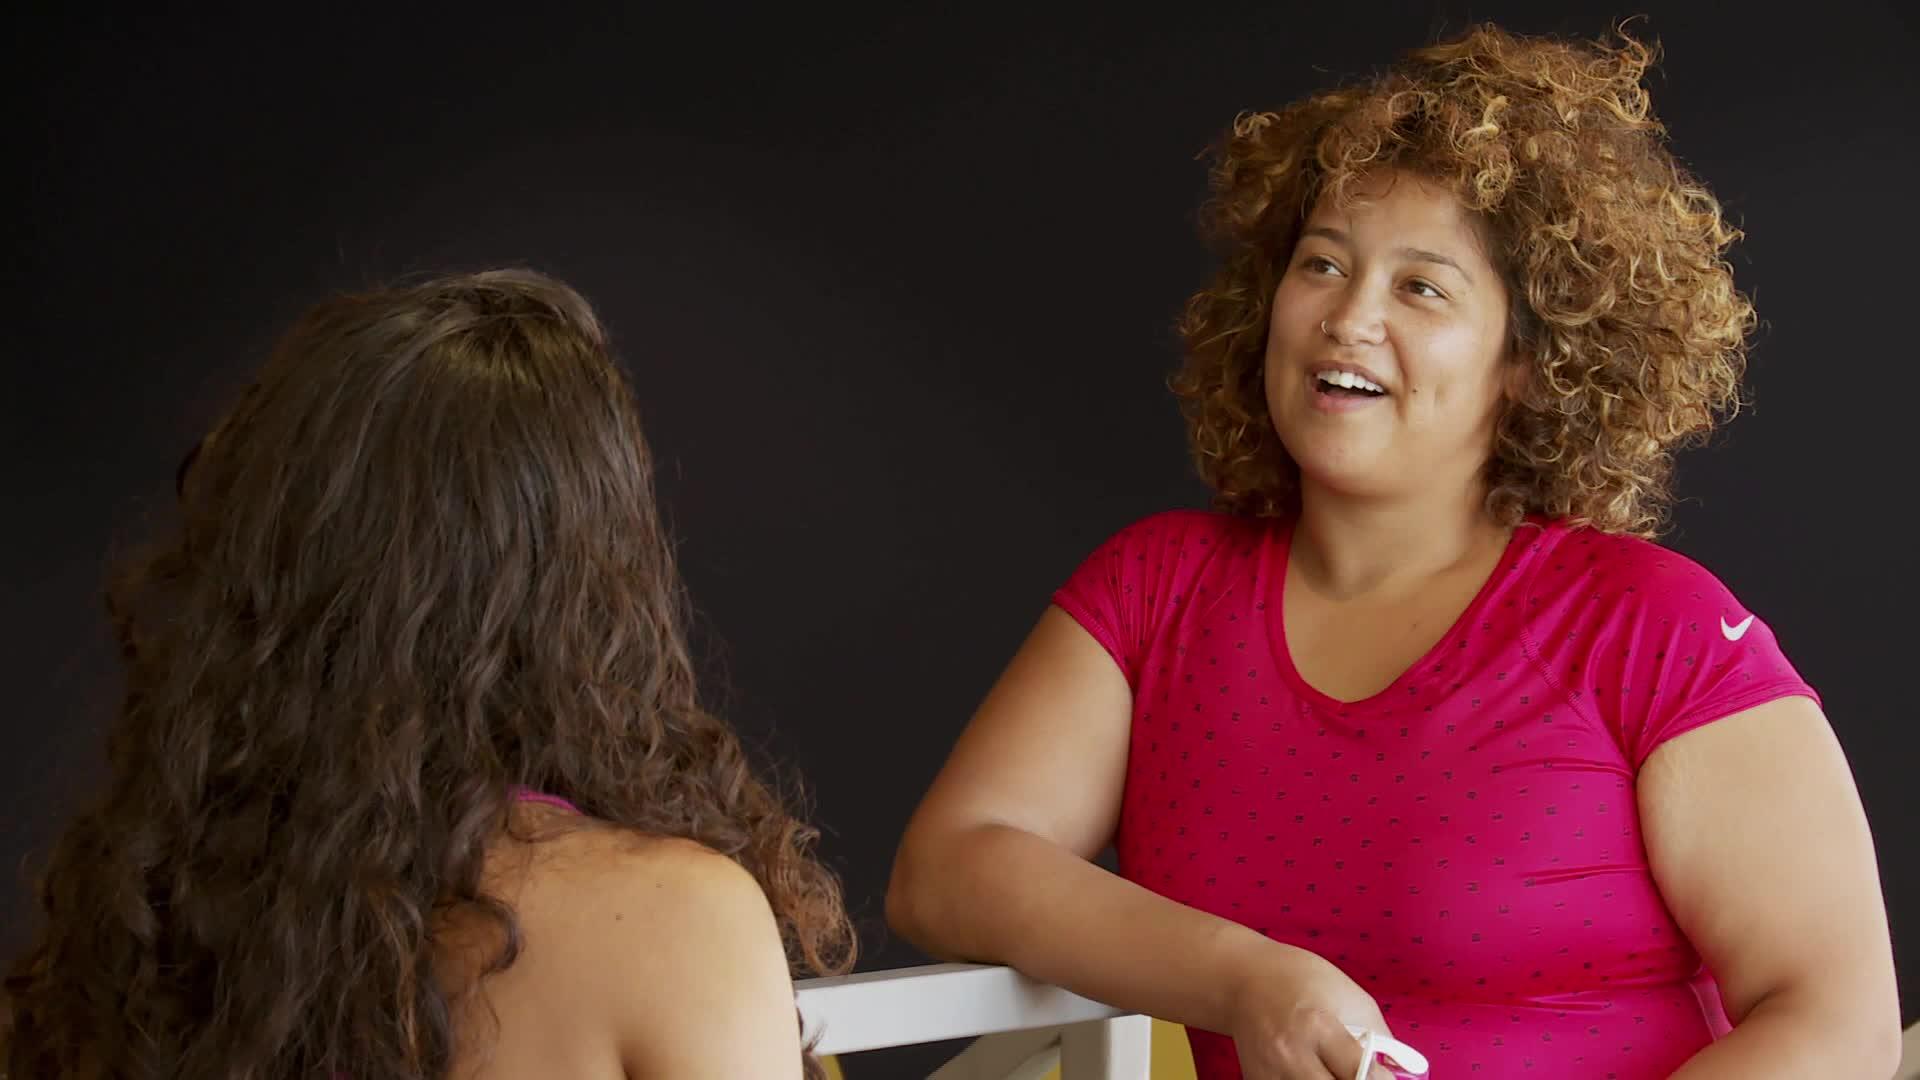 Fat Girl incontri problemi cs go livelli di matchmaking